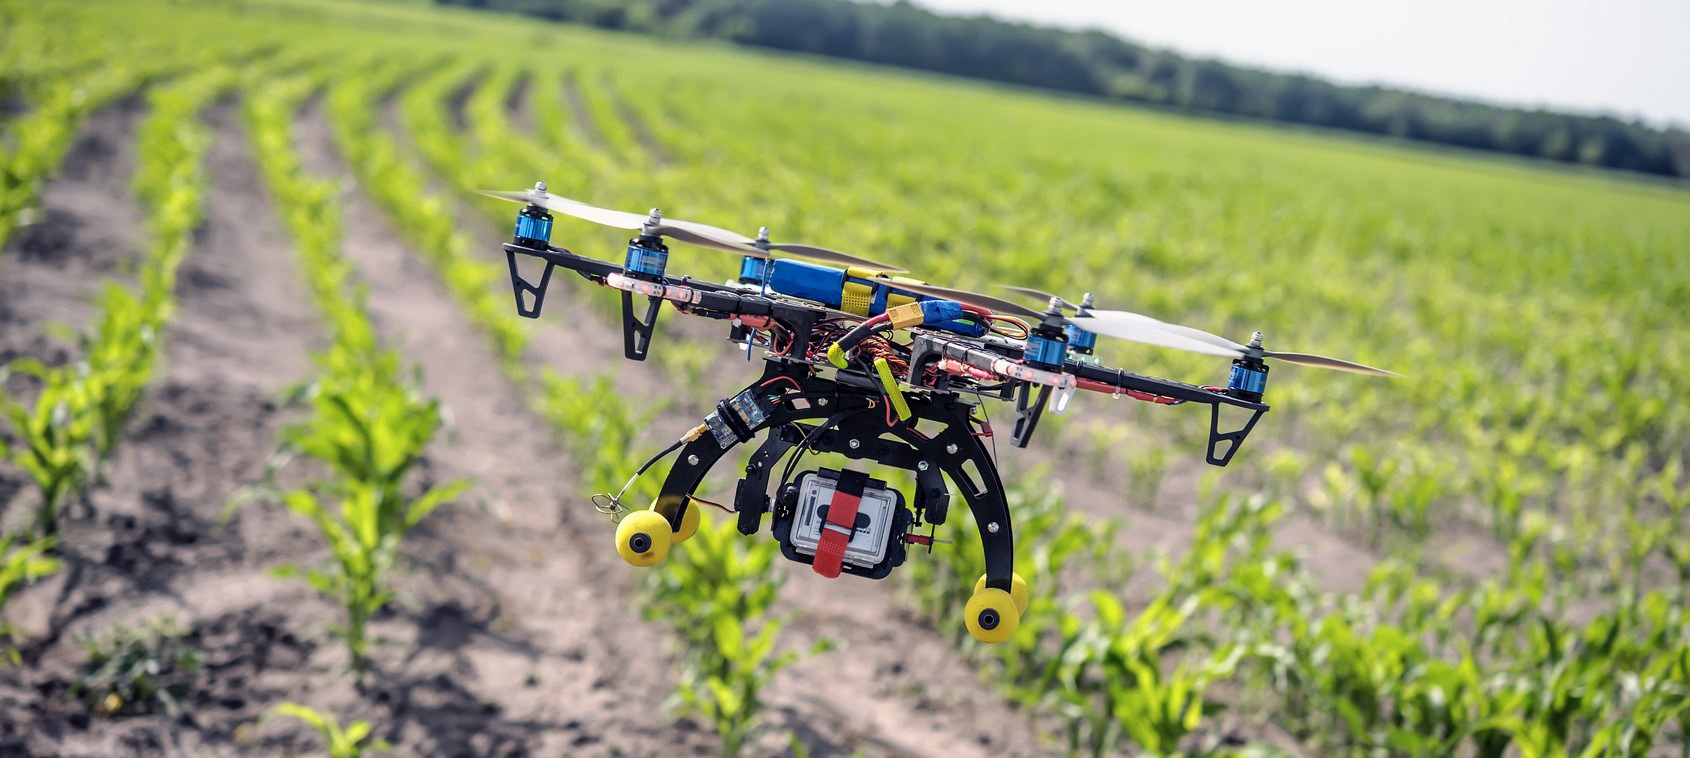 droni-in-agricoltura-banner.jpg